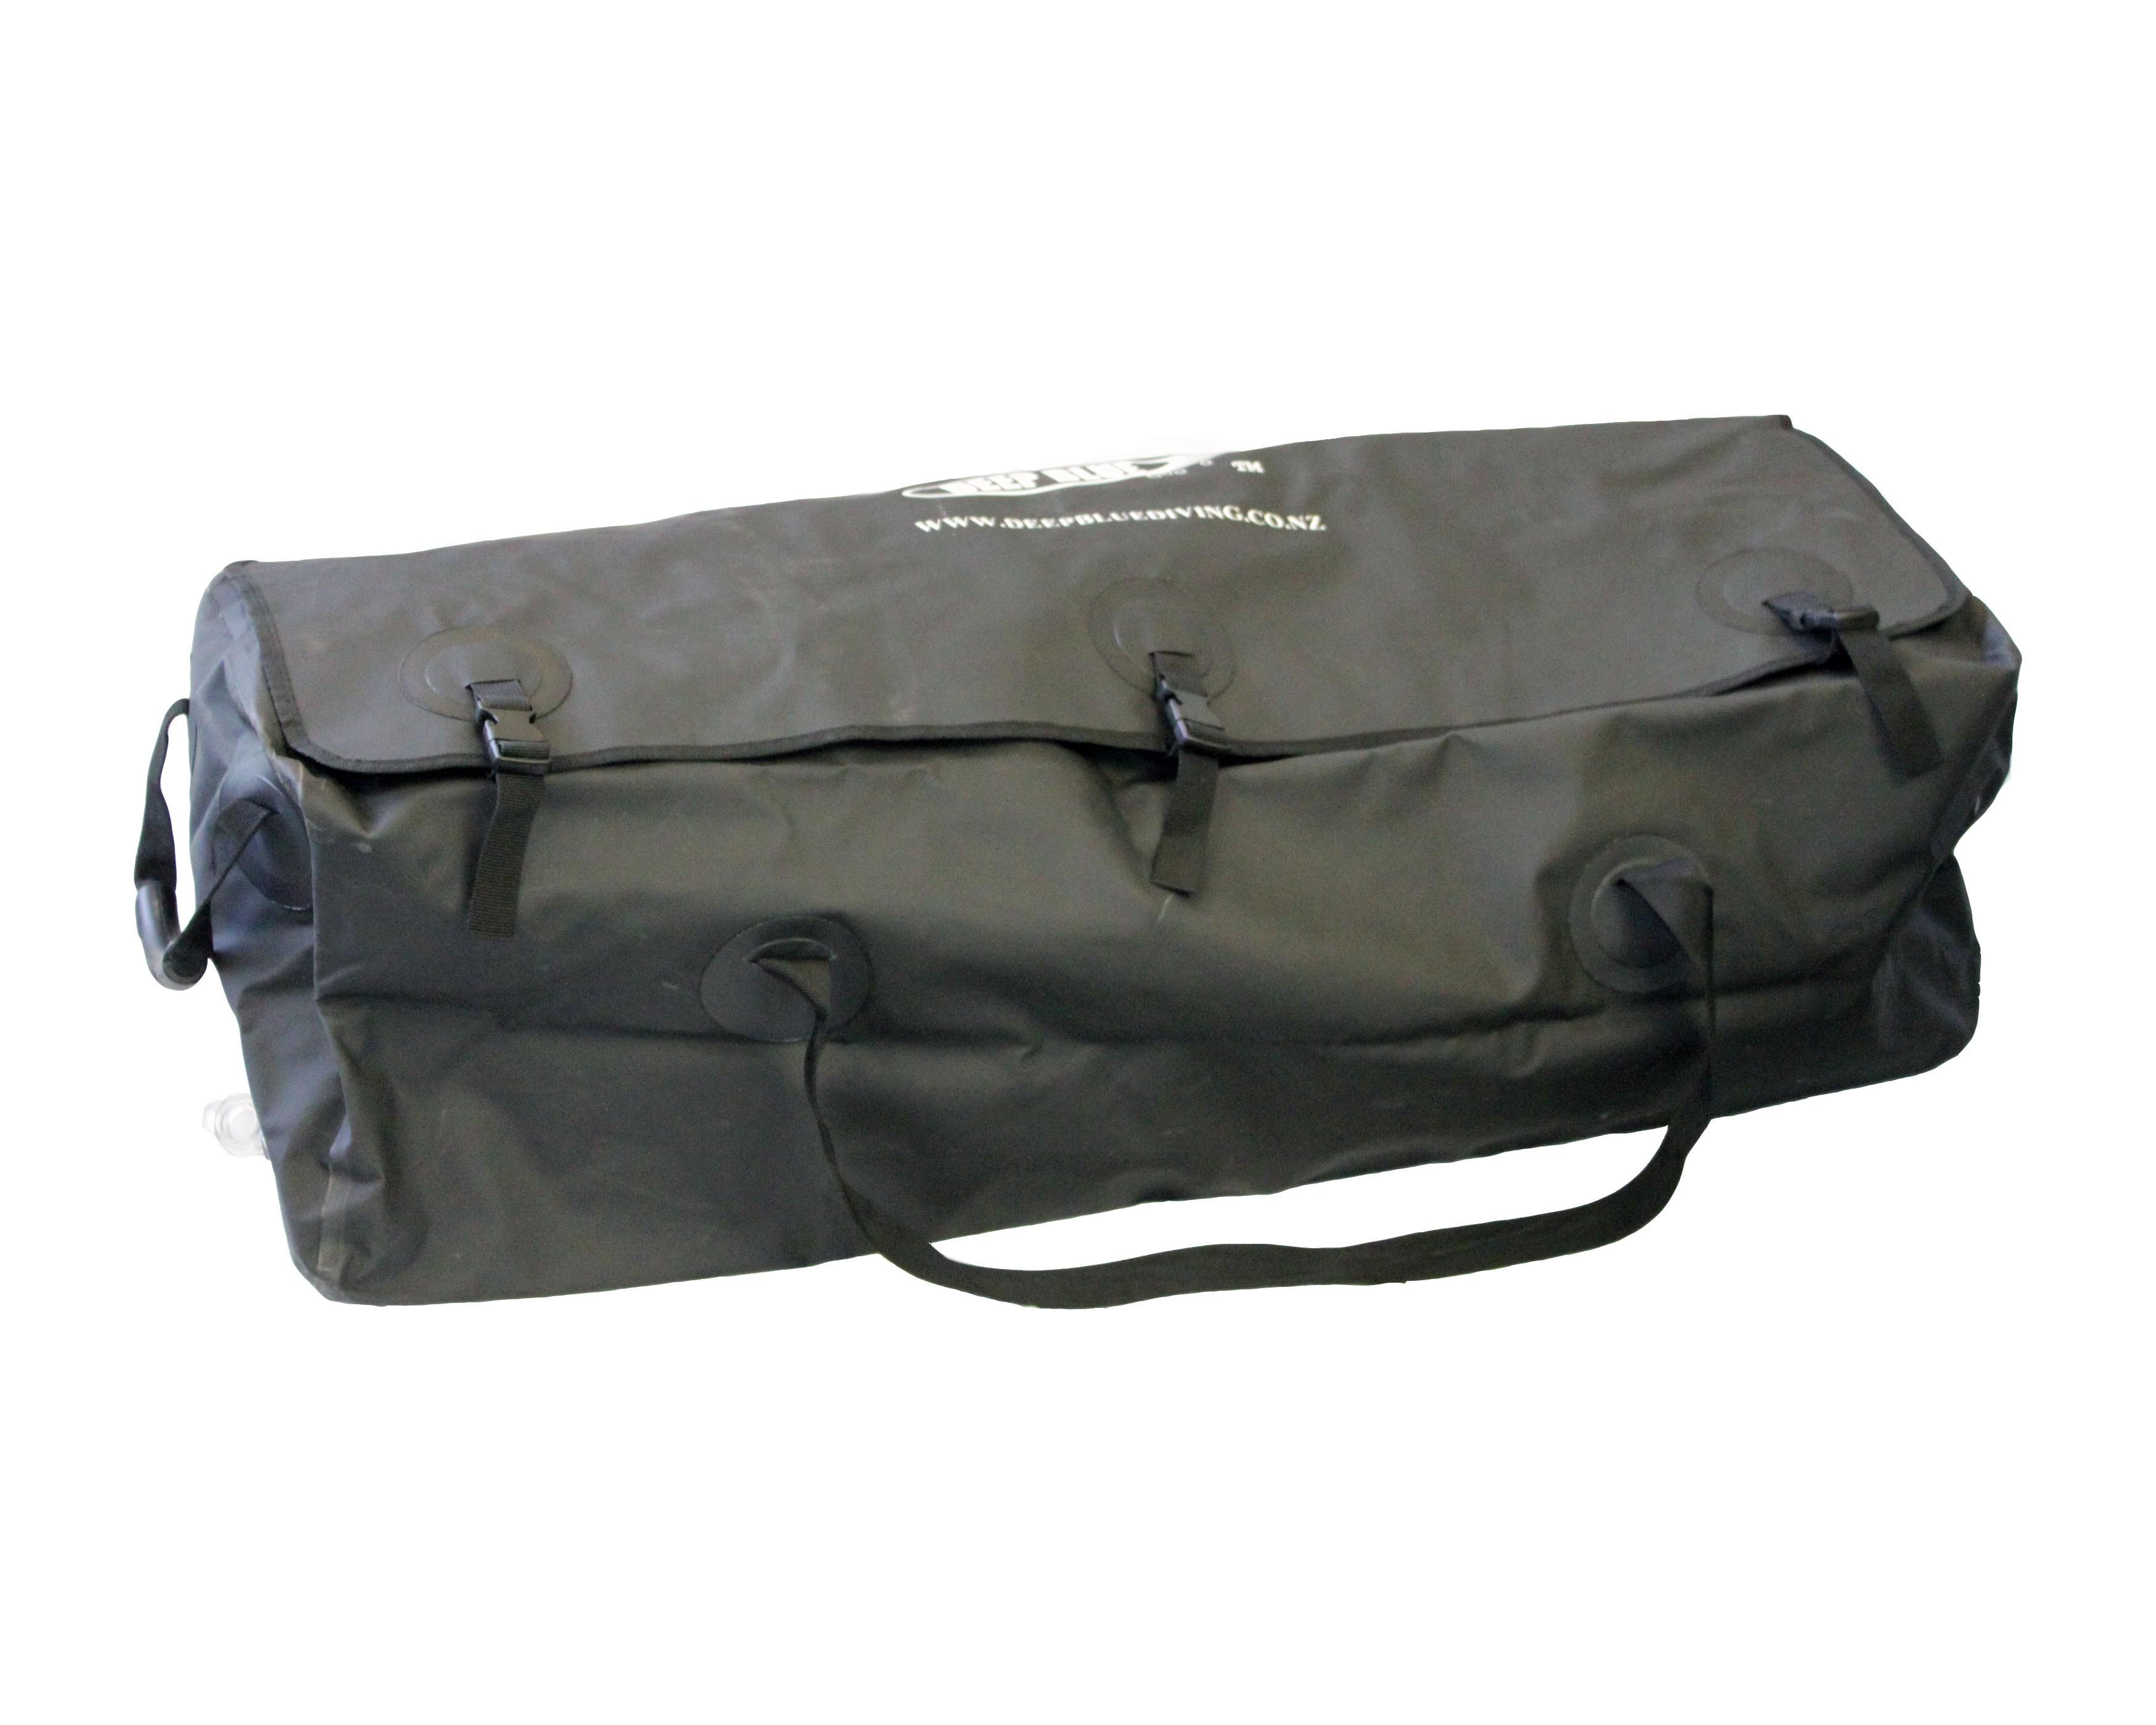 DEEP BLUE - Dive Gear Long Bag-  Fits Free Diving Fins